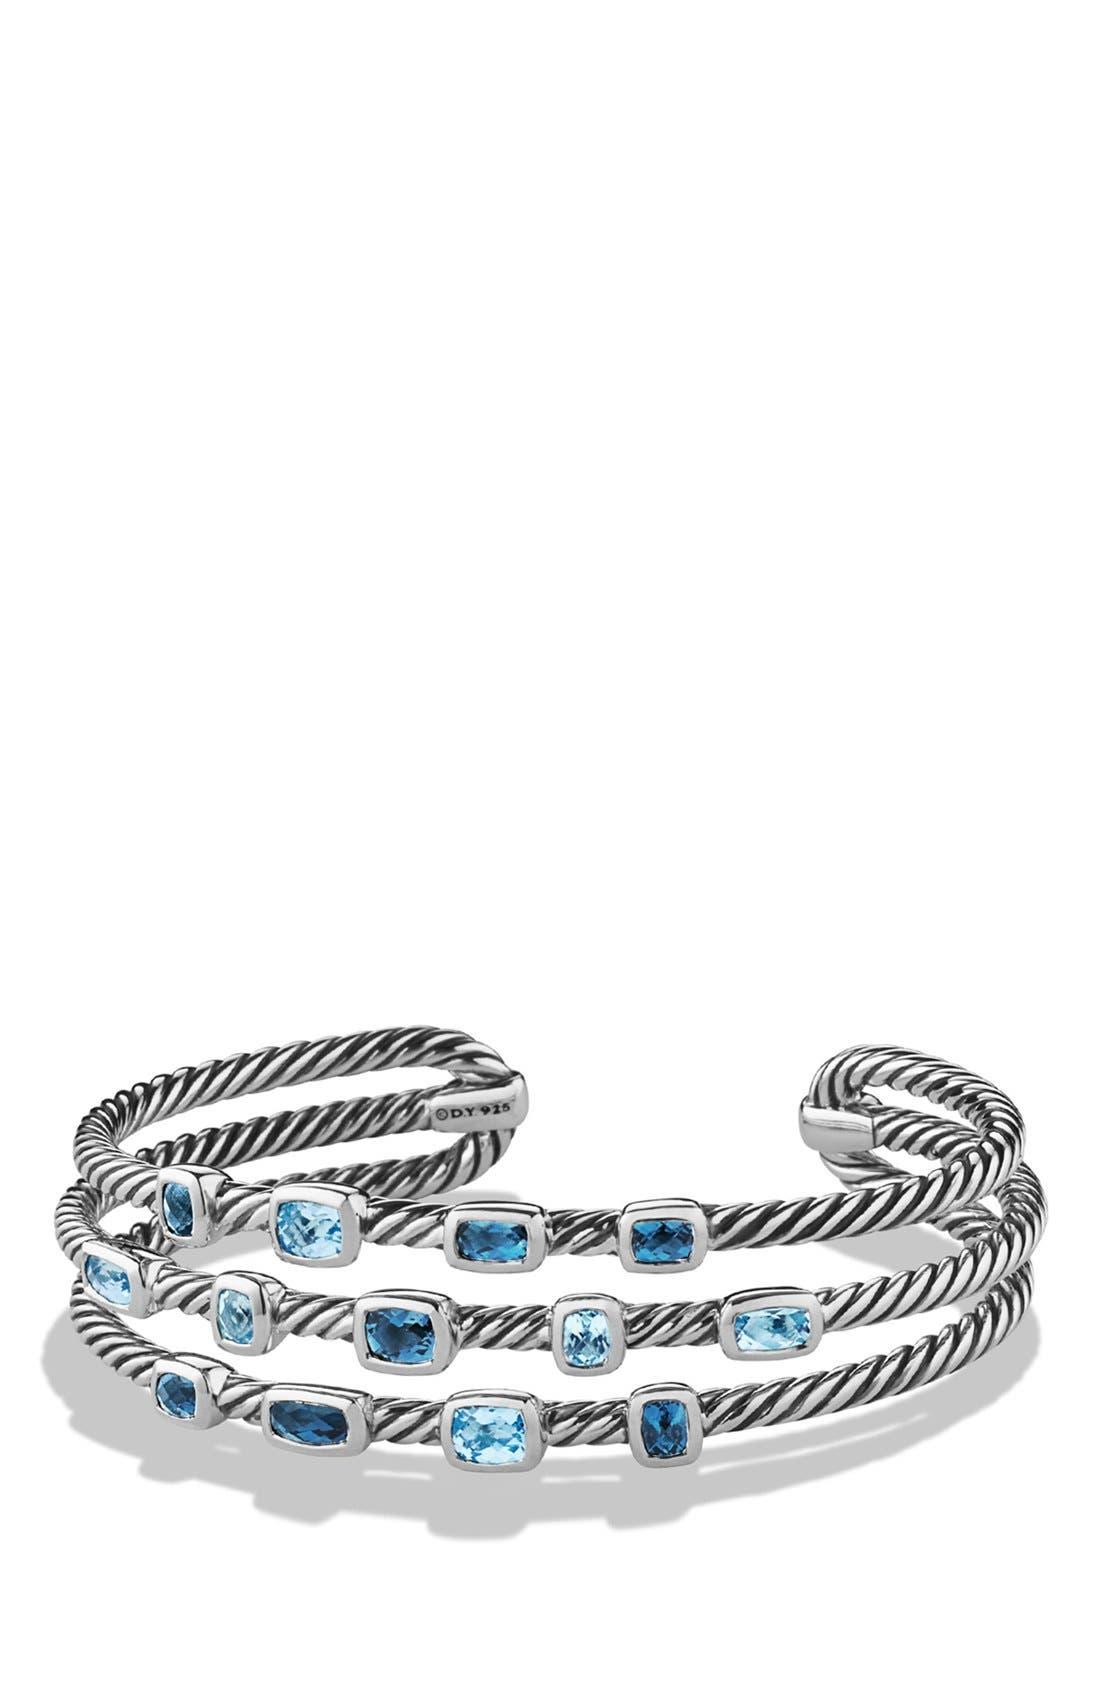 Alternate Image 1 Selected - David Yurman 'Confetti' Narrow Cuff Bracelet with Blue Topaz and Hampton Blue Topaz